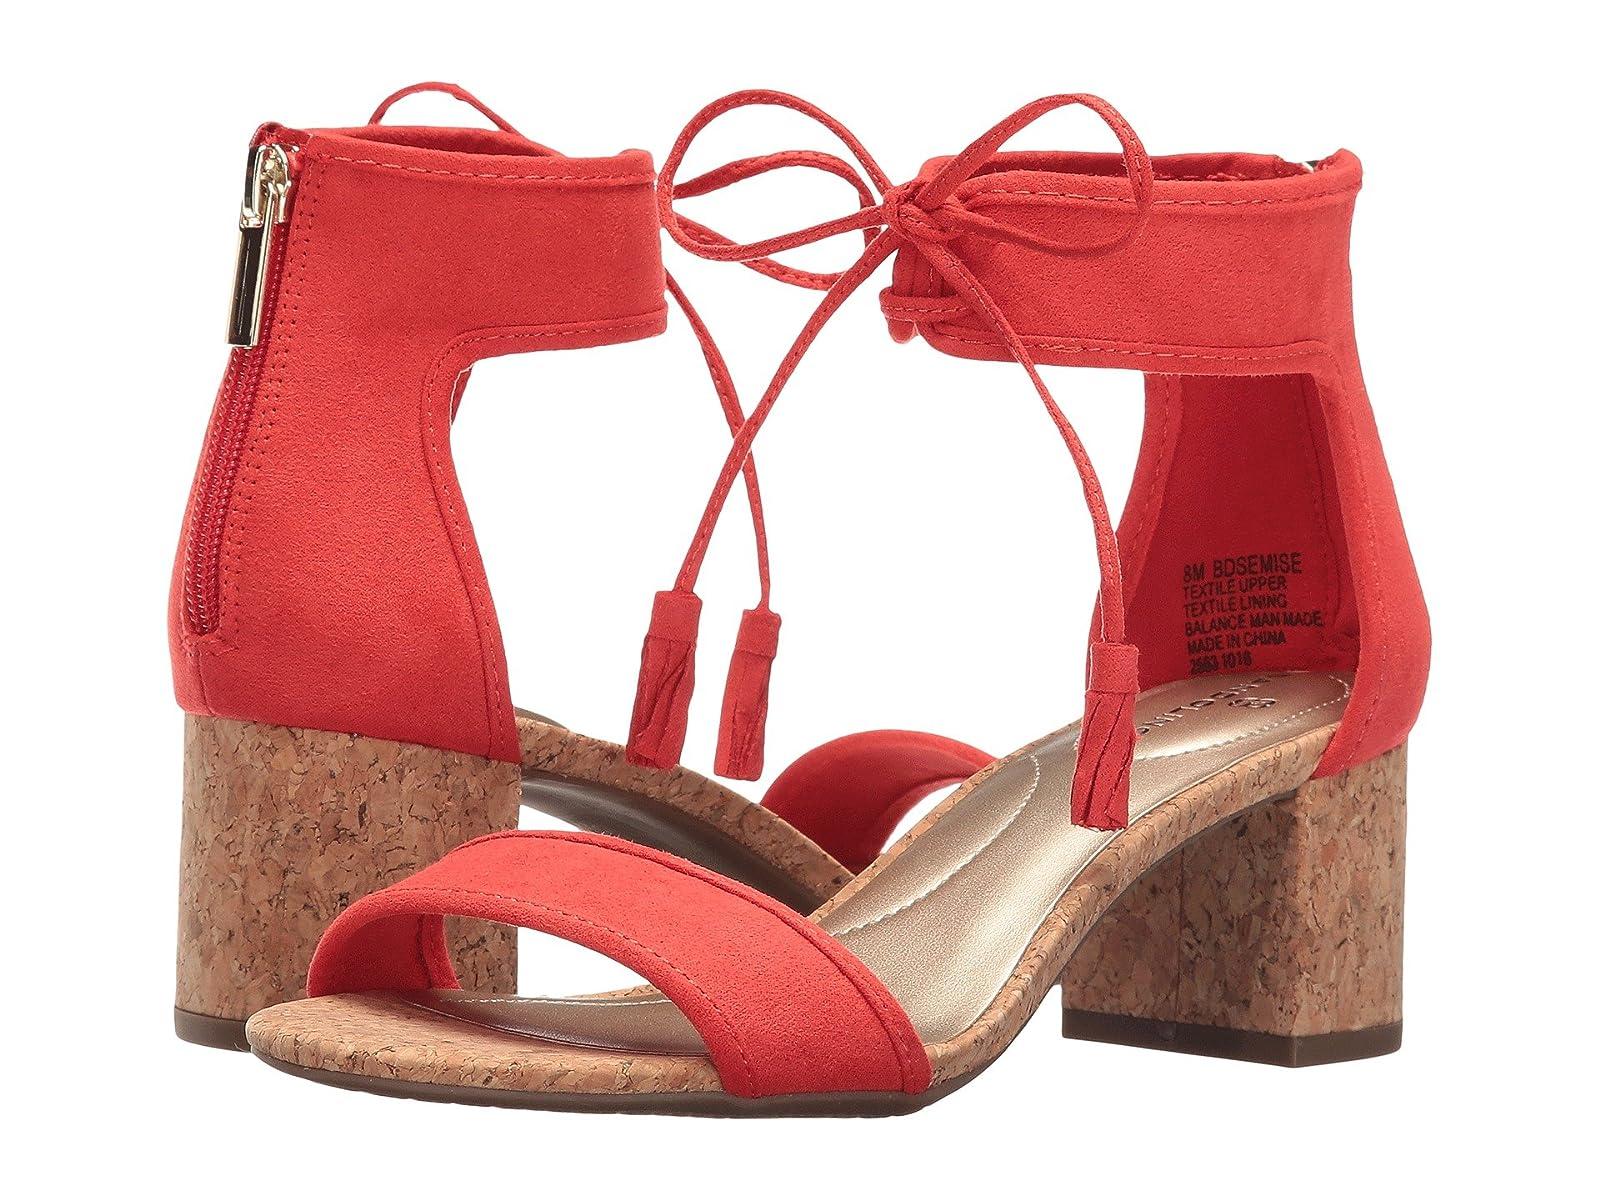 Bandolino SemiseCheap and distinctive eye-catching shoes